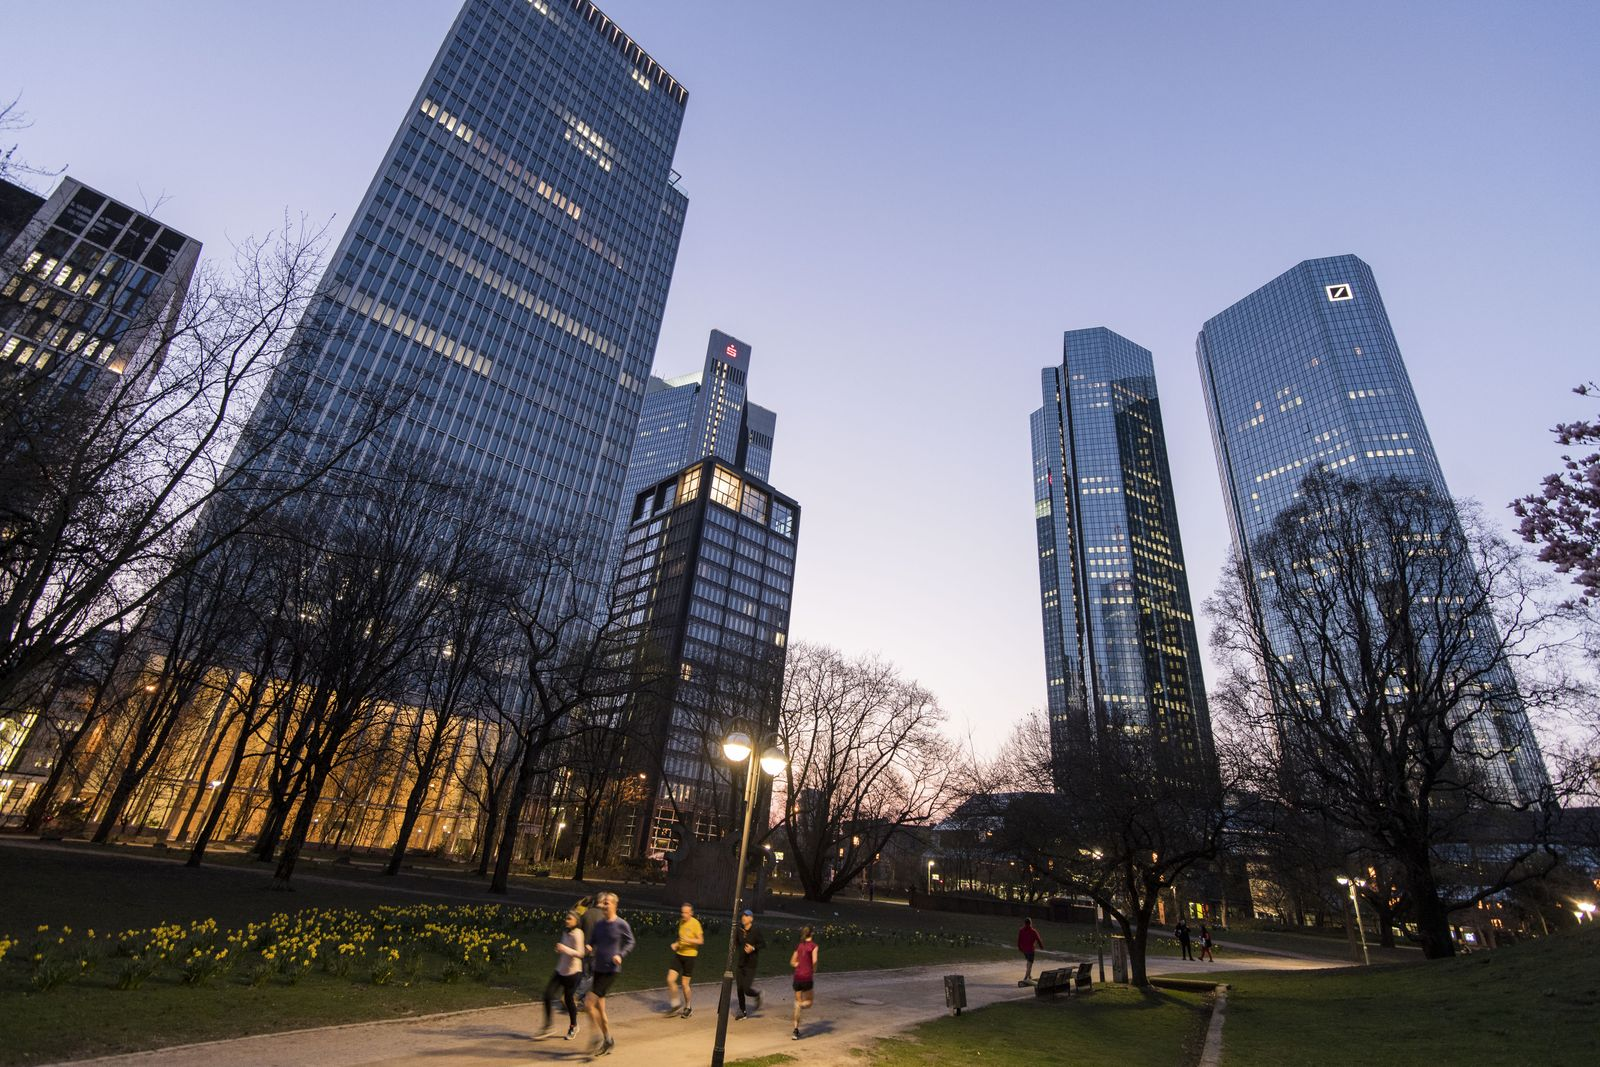 Frankfurt Finance District As Coronavirus Restrictions Go Into Effect